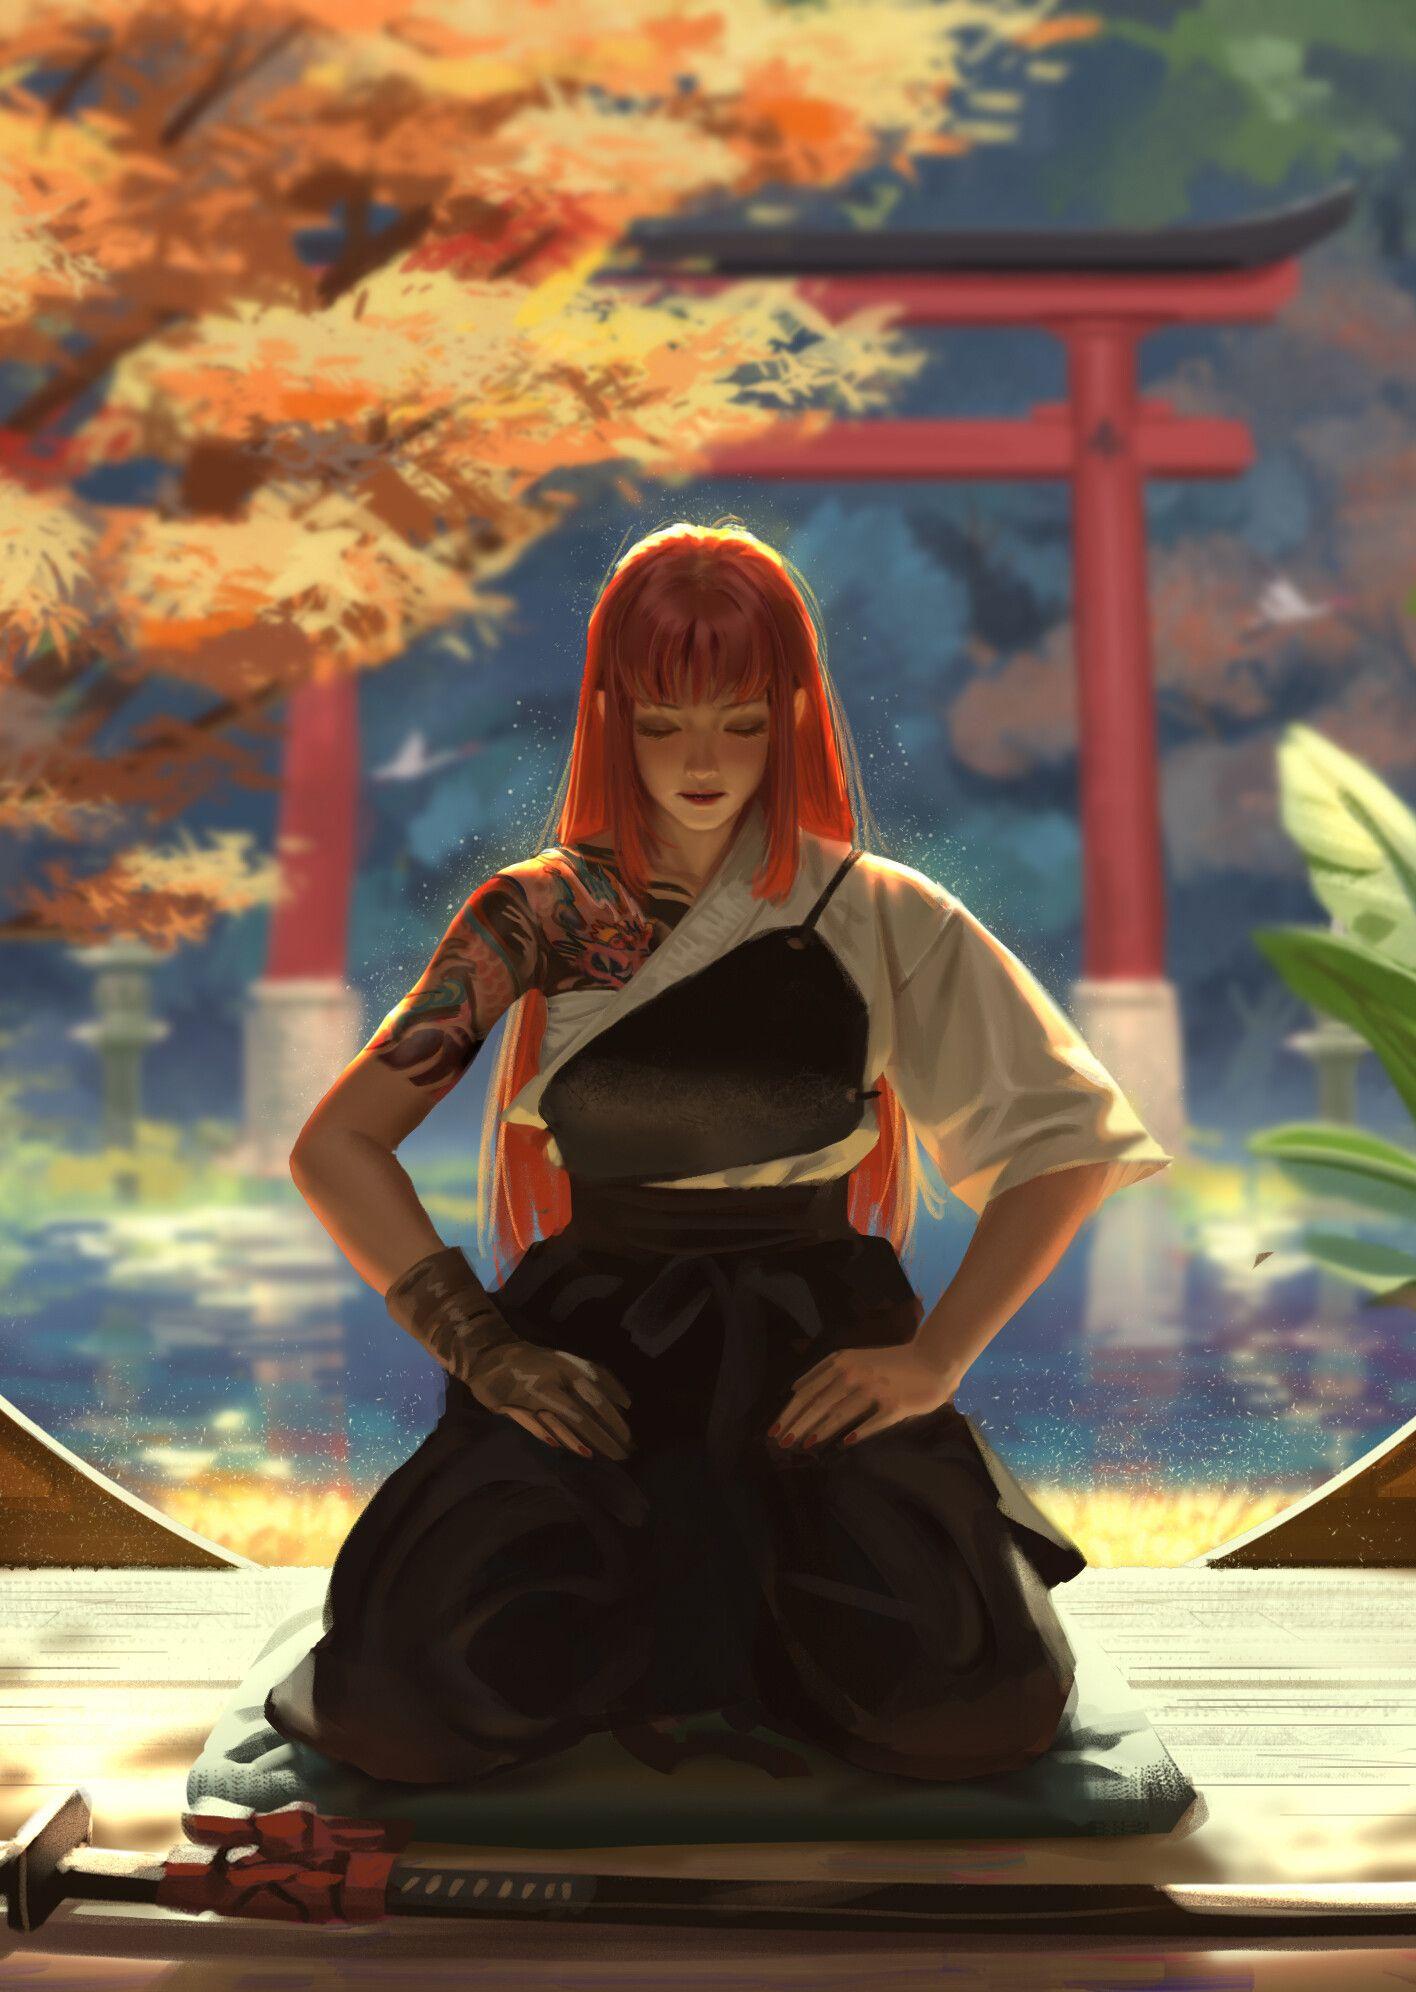 "ArtStation ""姬和子传"" 憩,侯中国 Samurai art, Anime redhead"